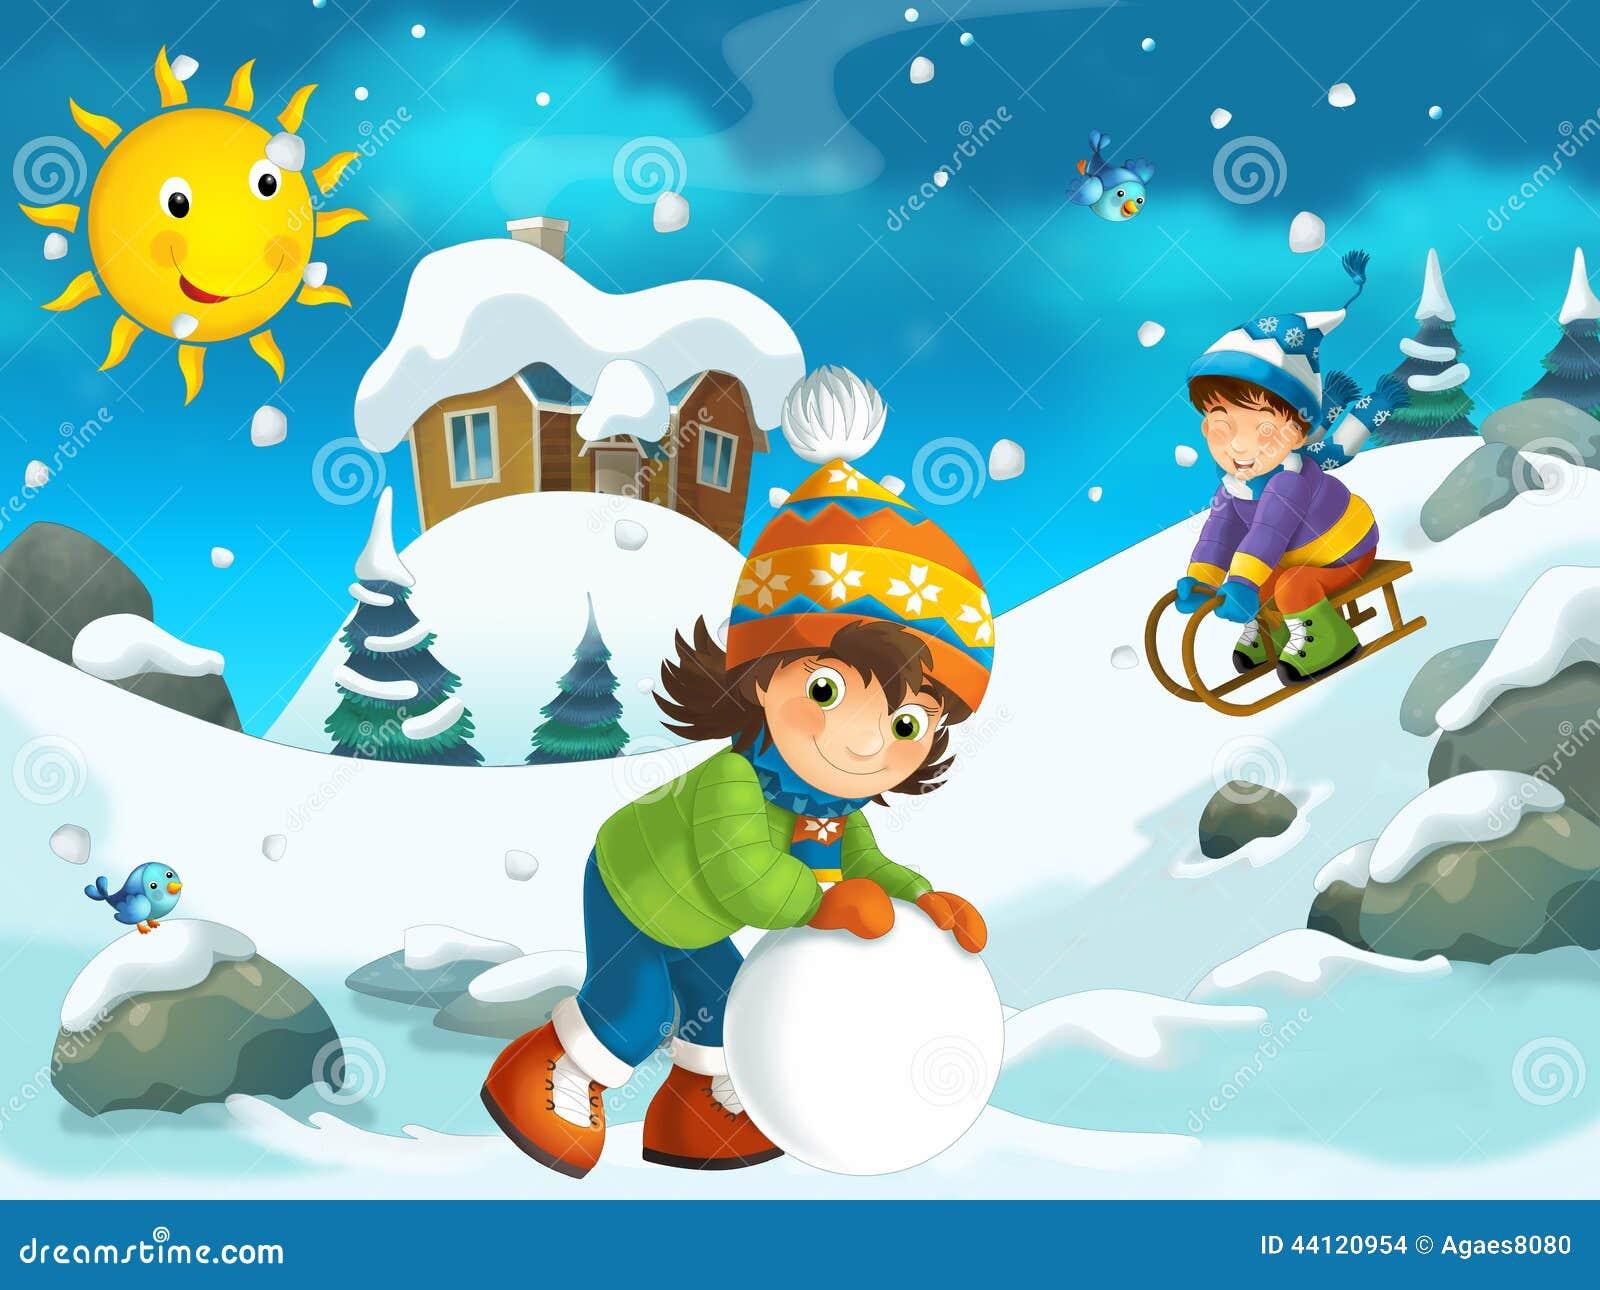 Winter Cartoon Illustration For The Children Stock ...